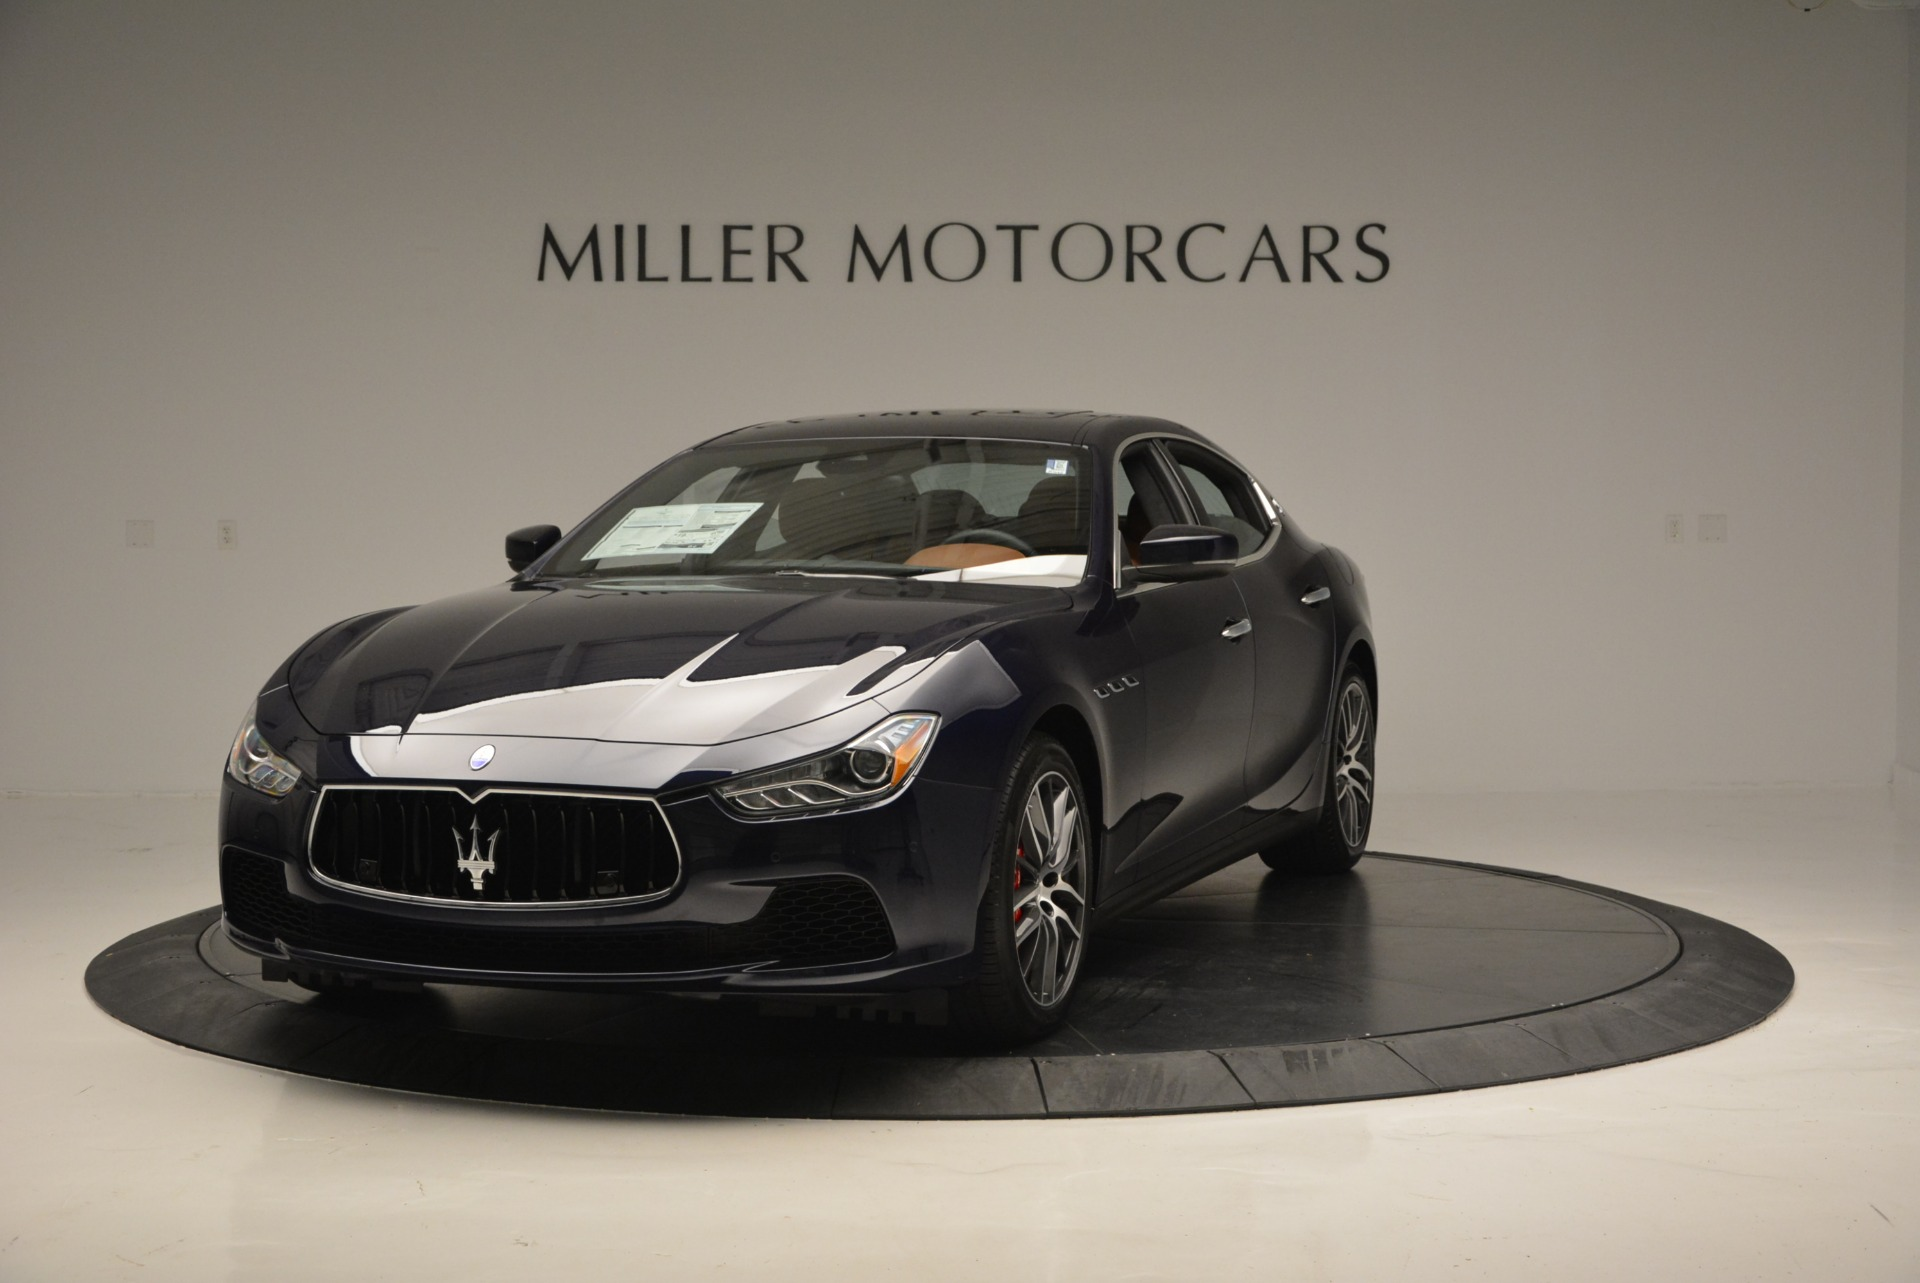 Used 2017 Maserati Ghibli S Q4 for sale $44,900 at Alfa Romeo of Greenwich in Greenwich CT 06830 1